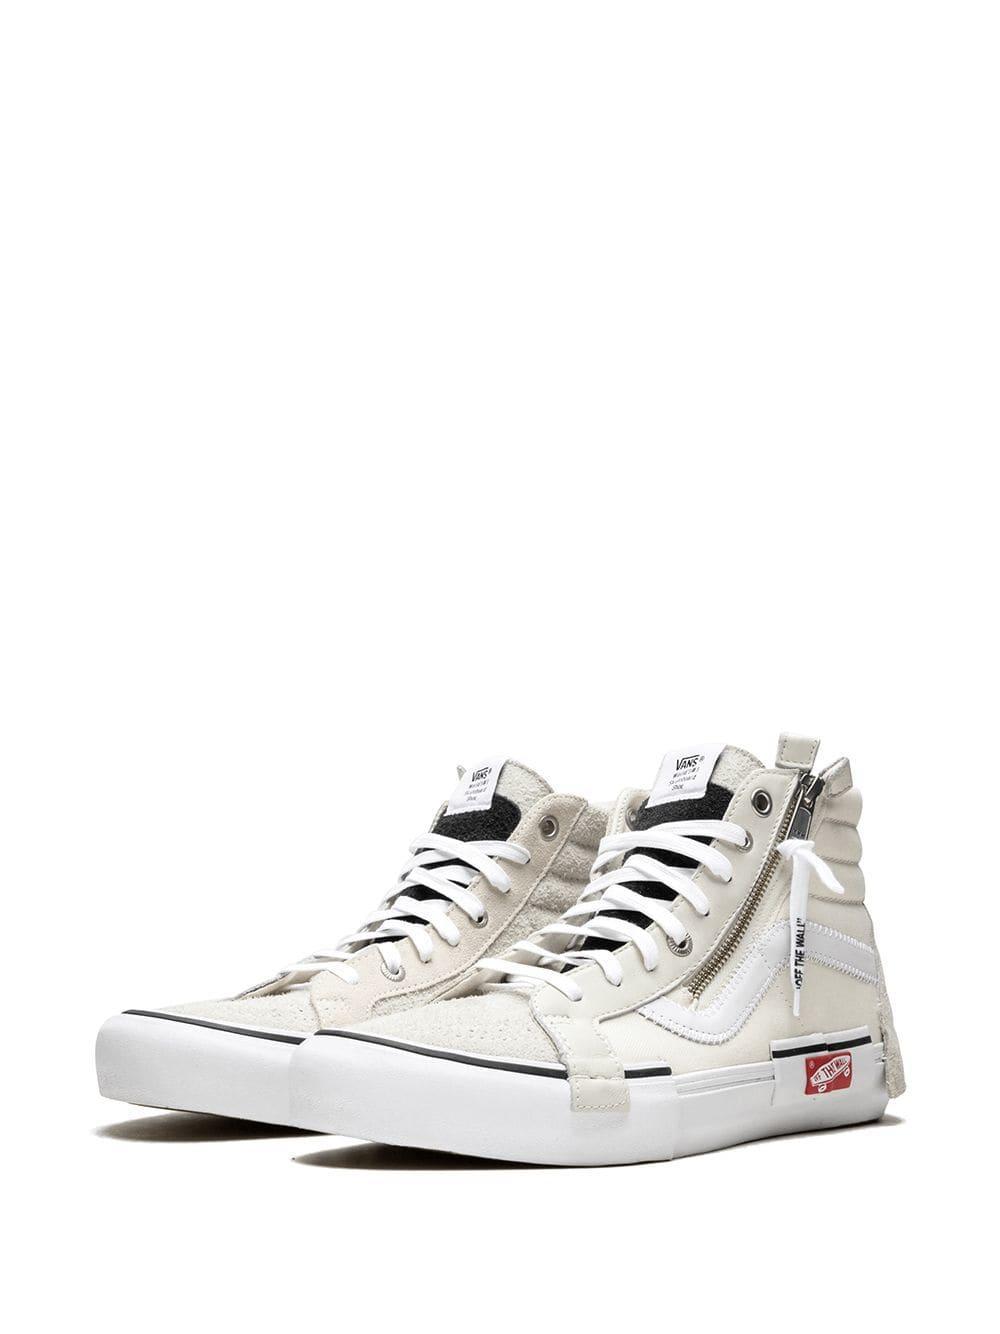 b693d05d951 Vans Sk8-hi Cap Lx Sneakers in White for Men - Lyst